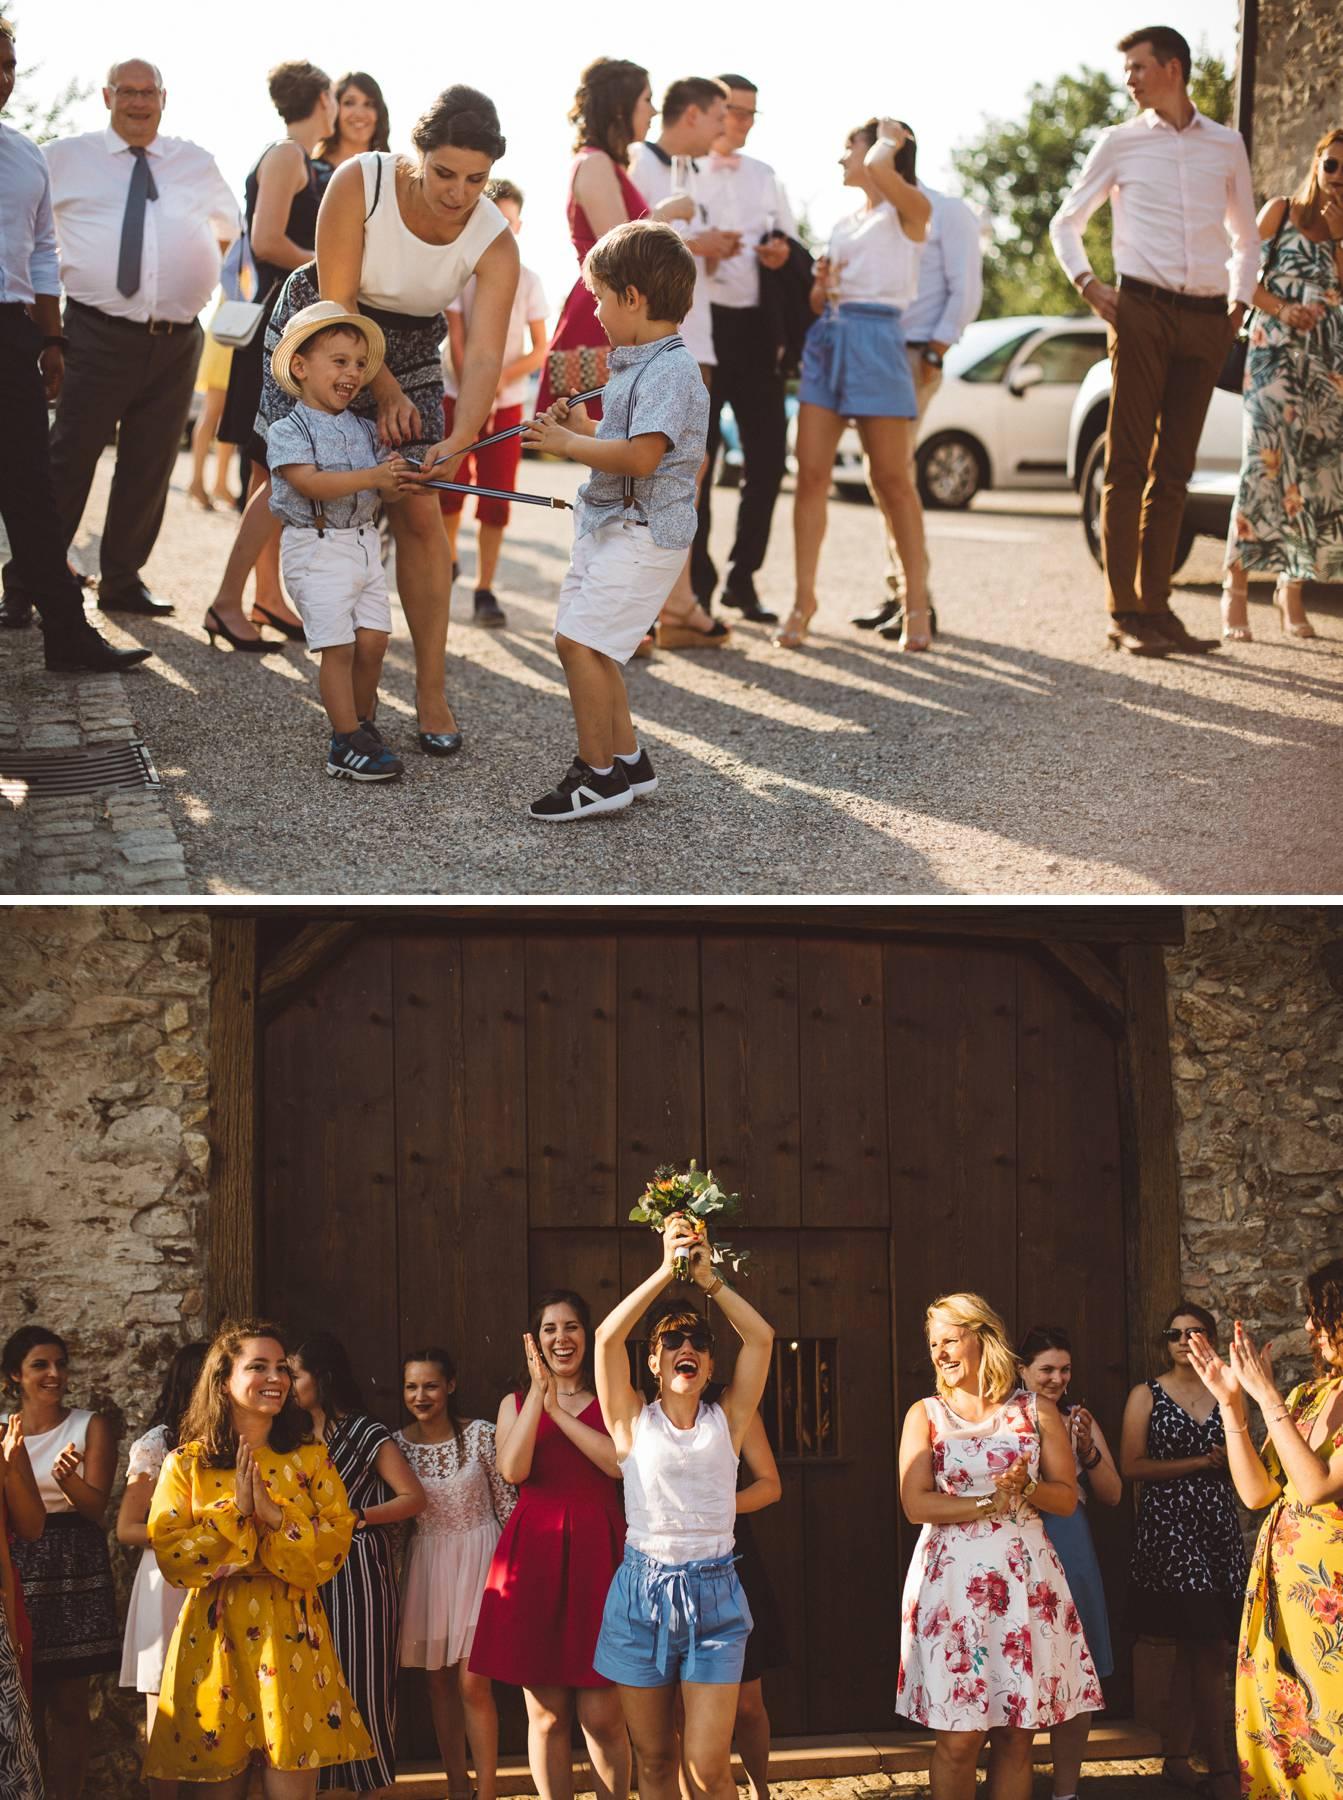 mariage-tropical-raben-horben_0028.jpg